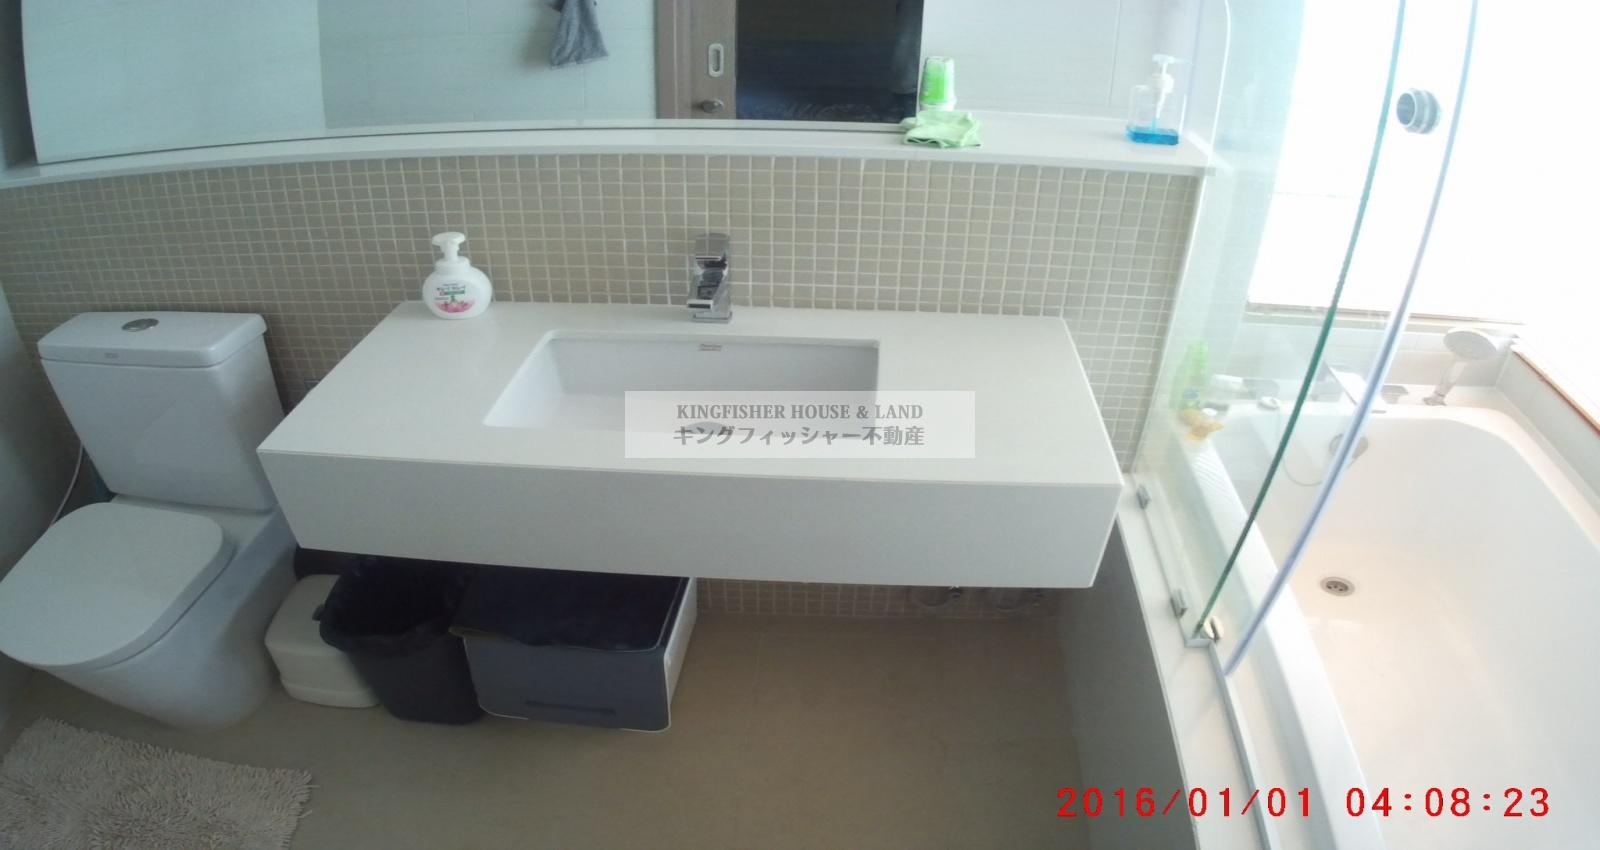 Sriracha, Thailand 20110, 1 ベッドルーム ベッドルーム, ,1 Bathroomバスルーム,コンドミニアム,賃貸物件,1310